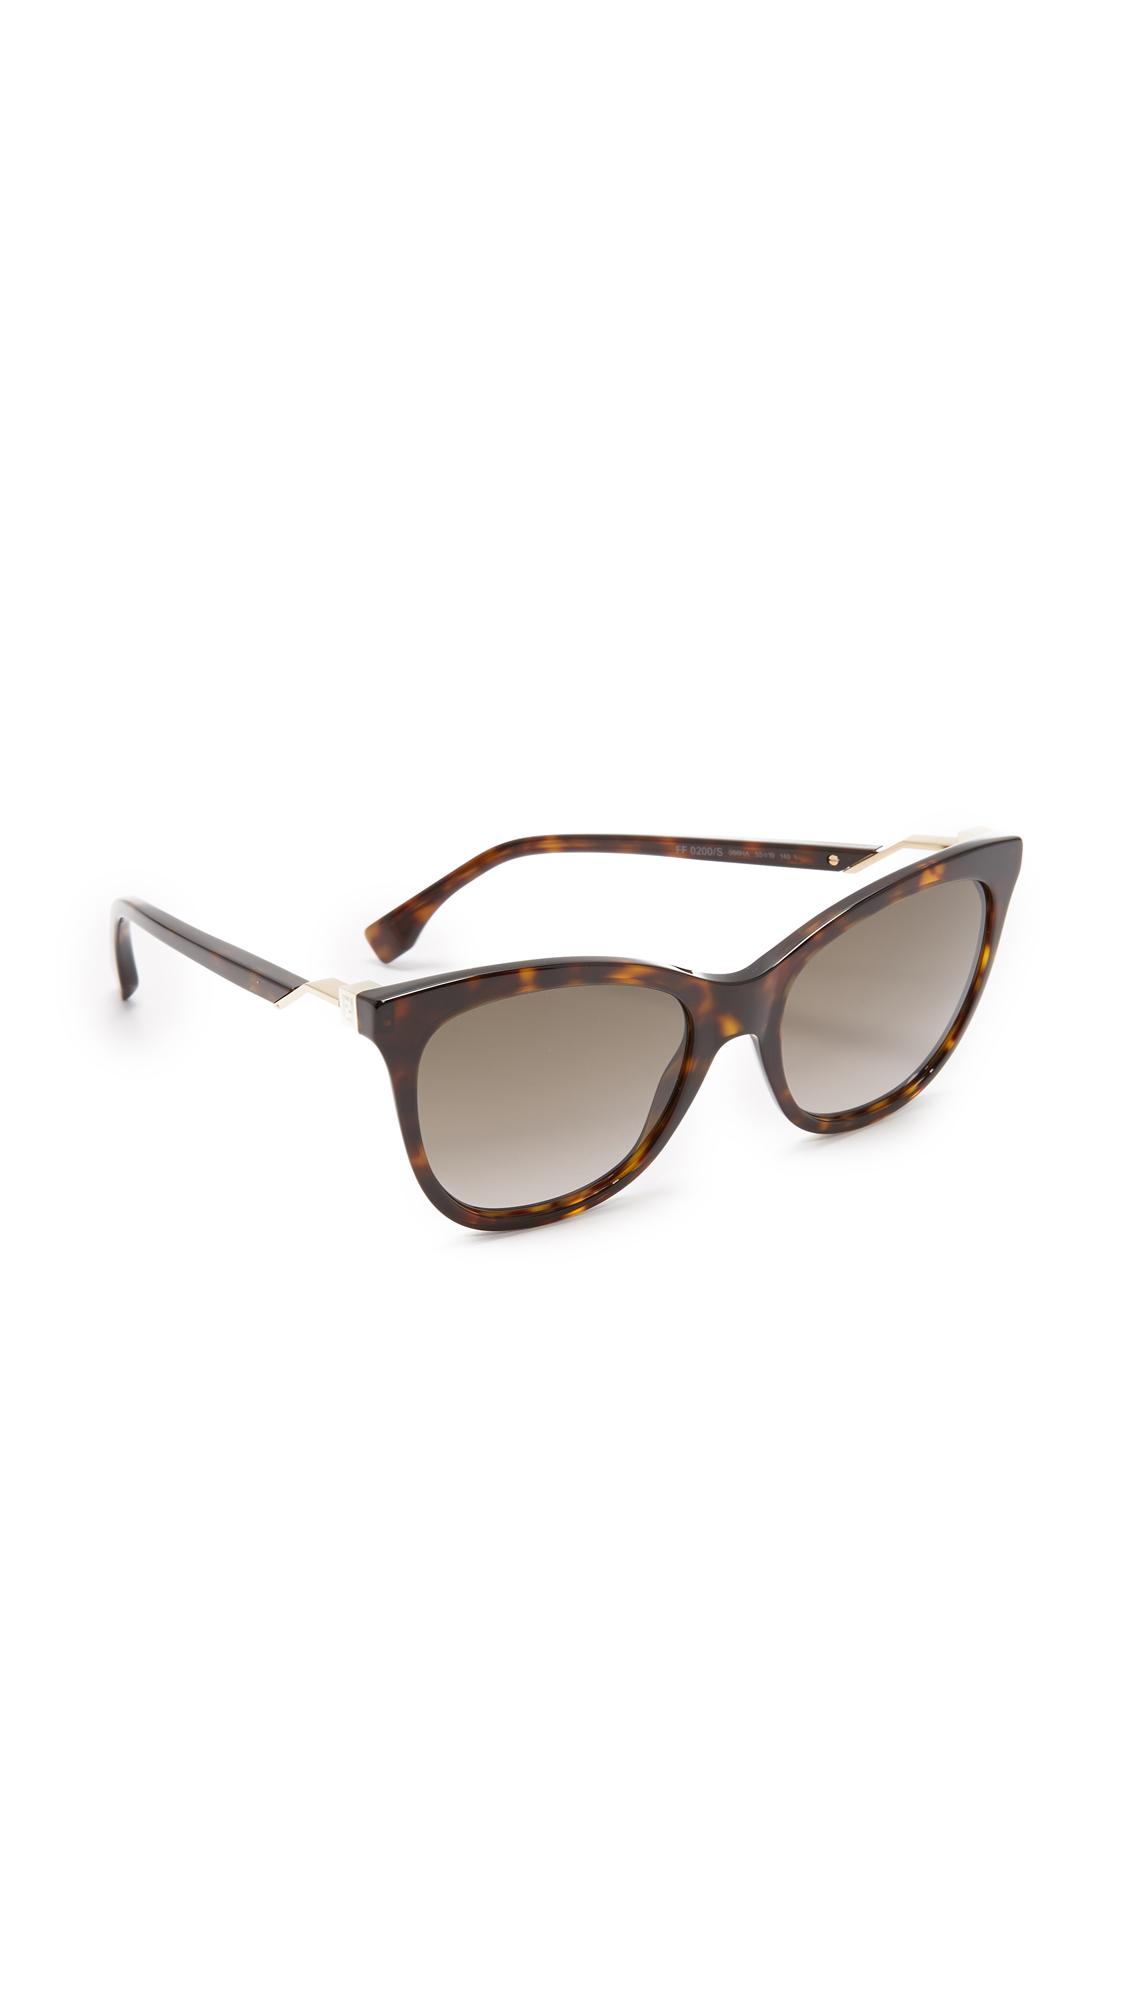 Fendi Cube Sunglasses - Havana/Brown at Shopbop